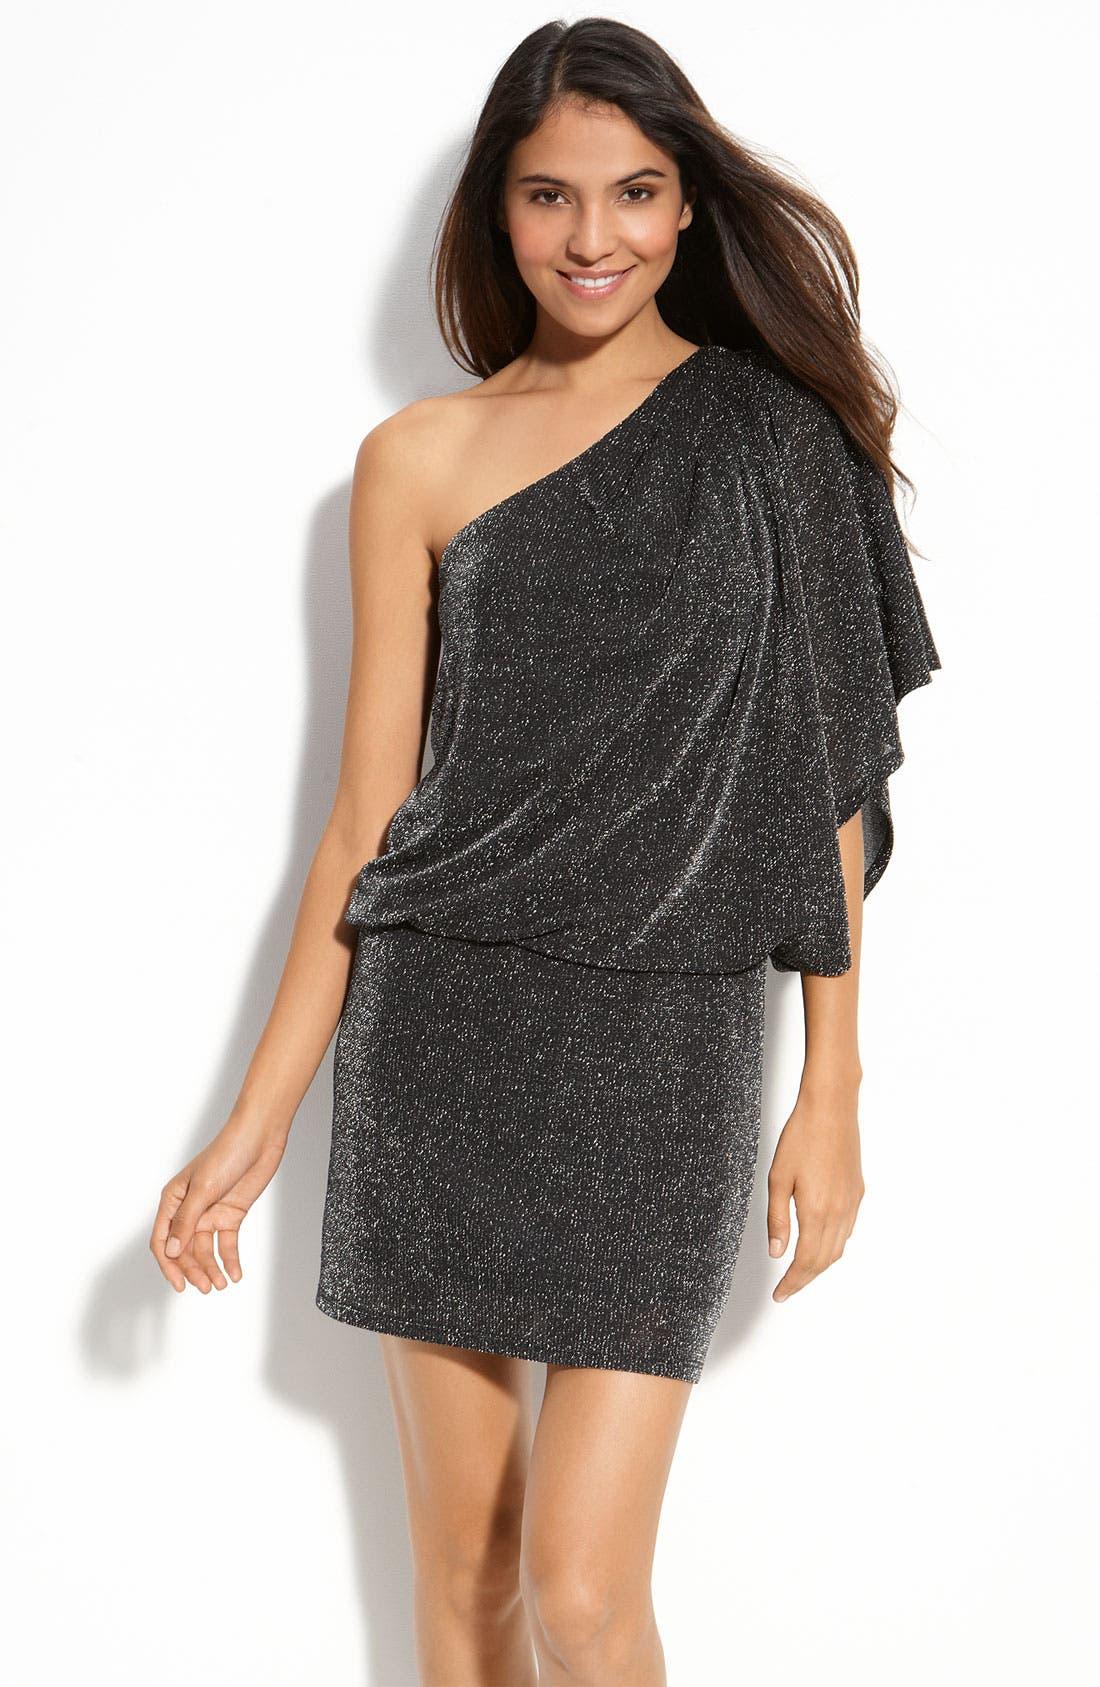 Alternate Image 1 Selected - JS Boutique Metallic Knit Dress (Petite)